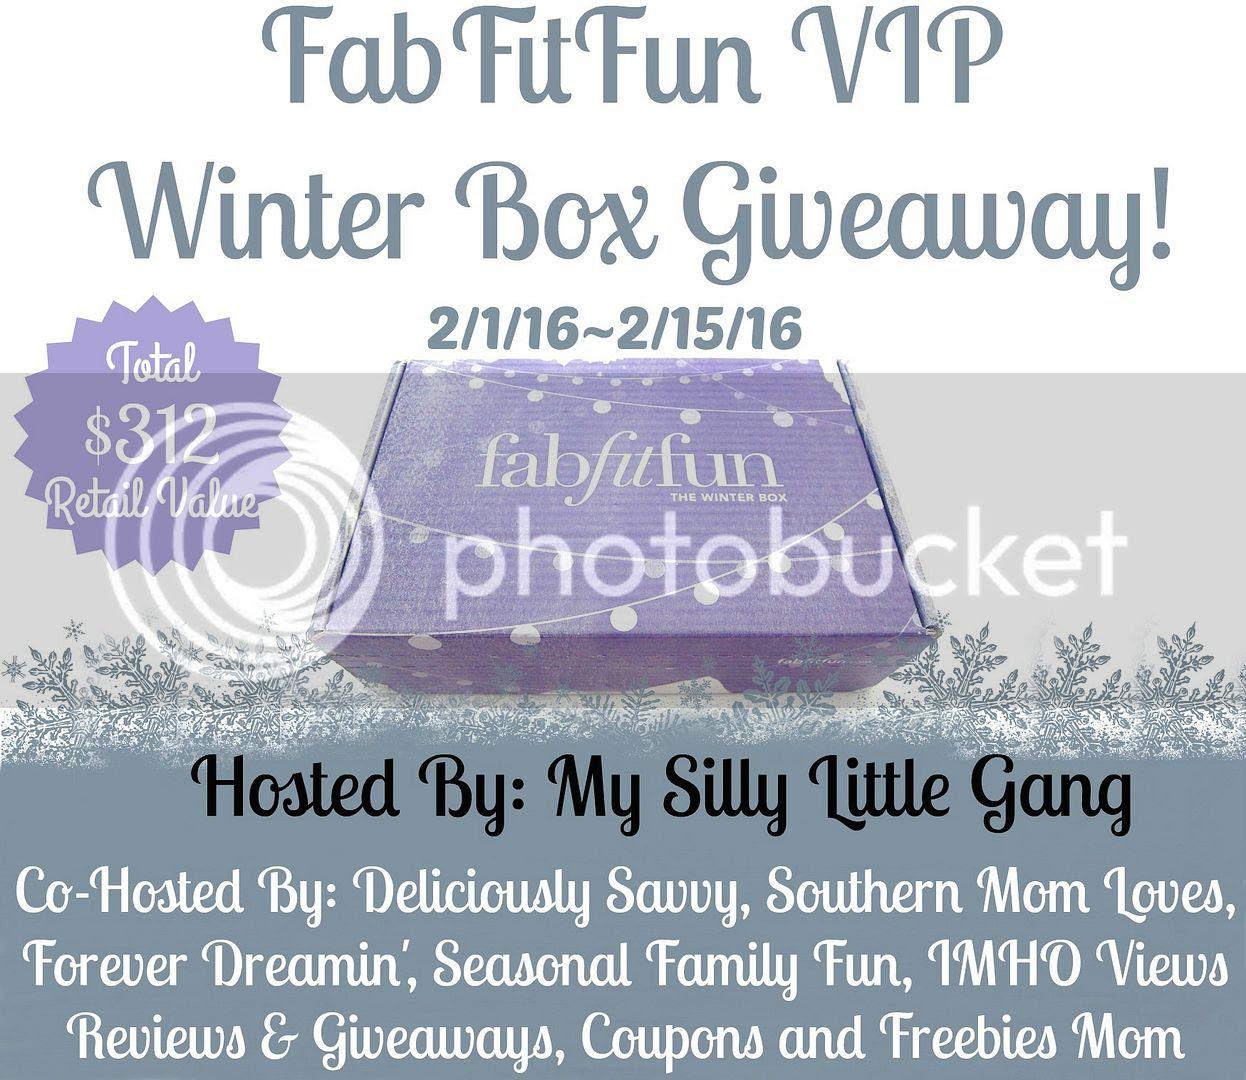 fabfitfun winter box giveaway